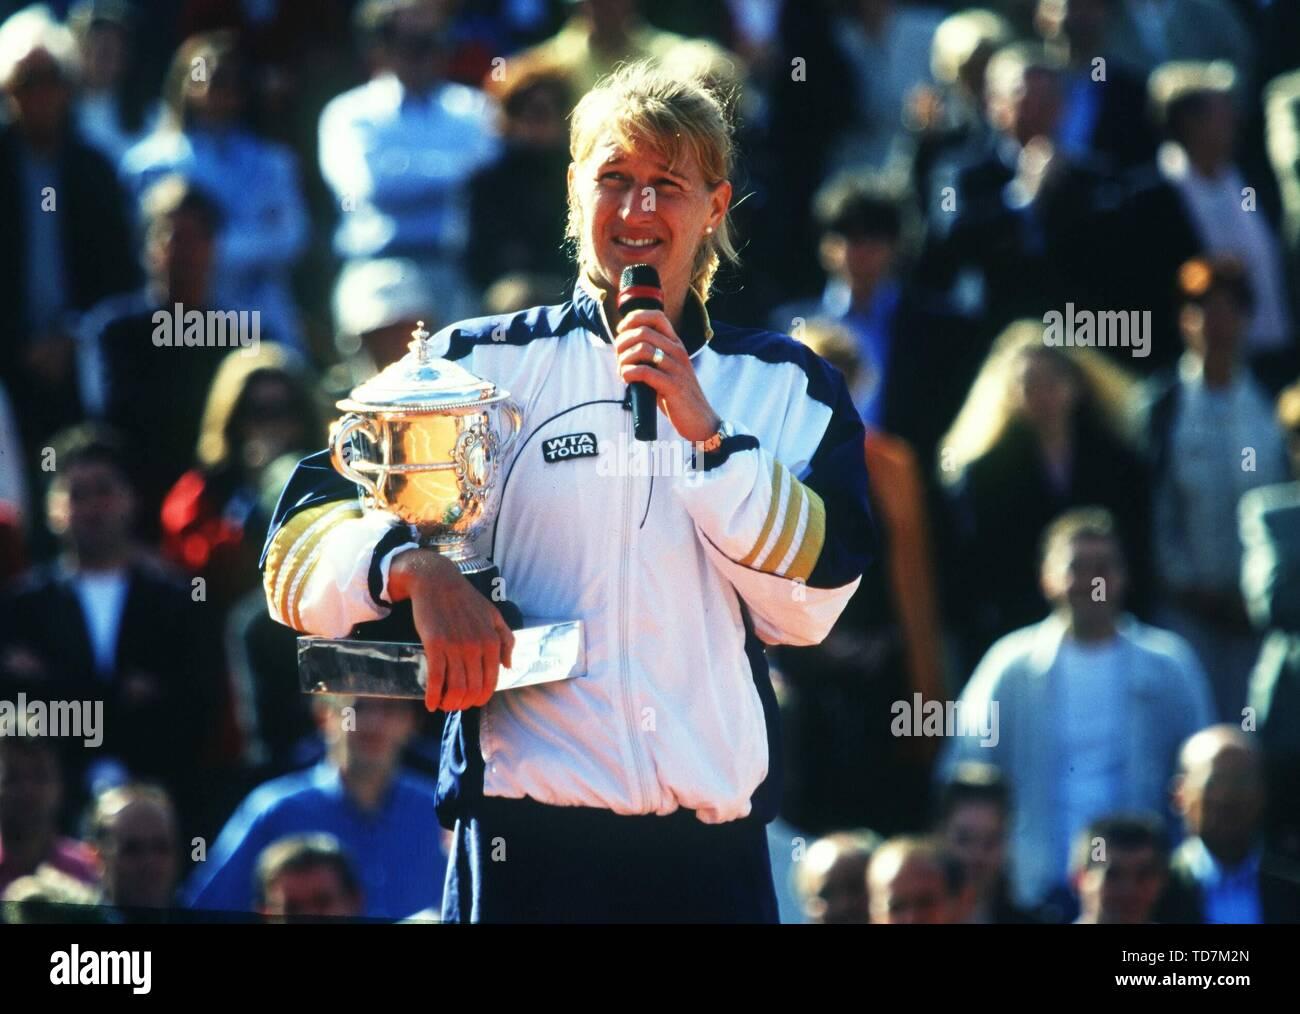 Paris, Frankreich. 10th Sep, 2015. Tennis: Paris French Open 05/1999 Steffi Stefanie Steffanie Graf Final Presentation Roland Garros jubilation on her 22 Grand Slam title | usage worldwide Credit: dpa/Alamy Live News - Stock Image